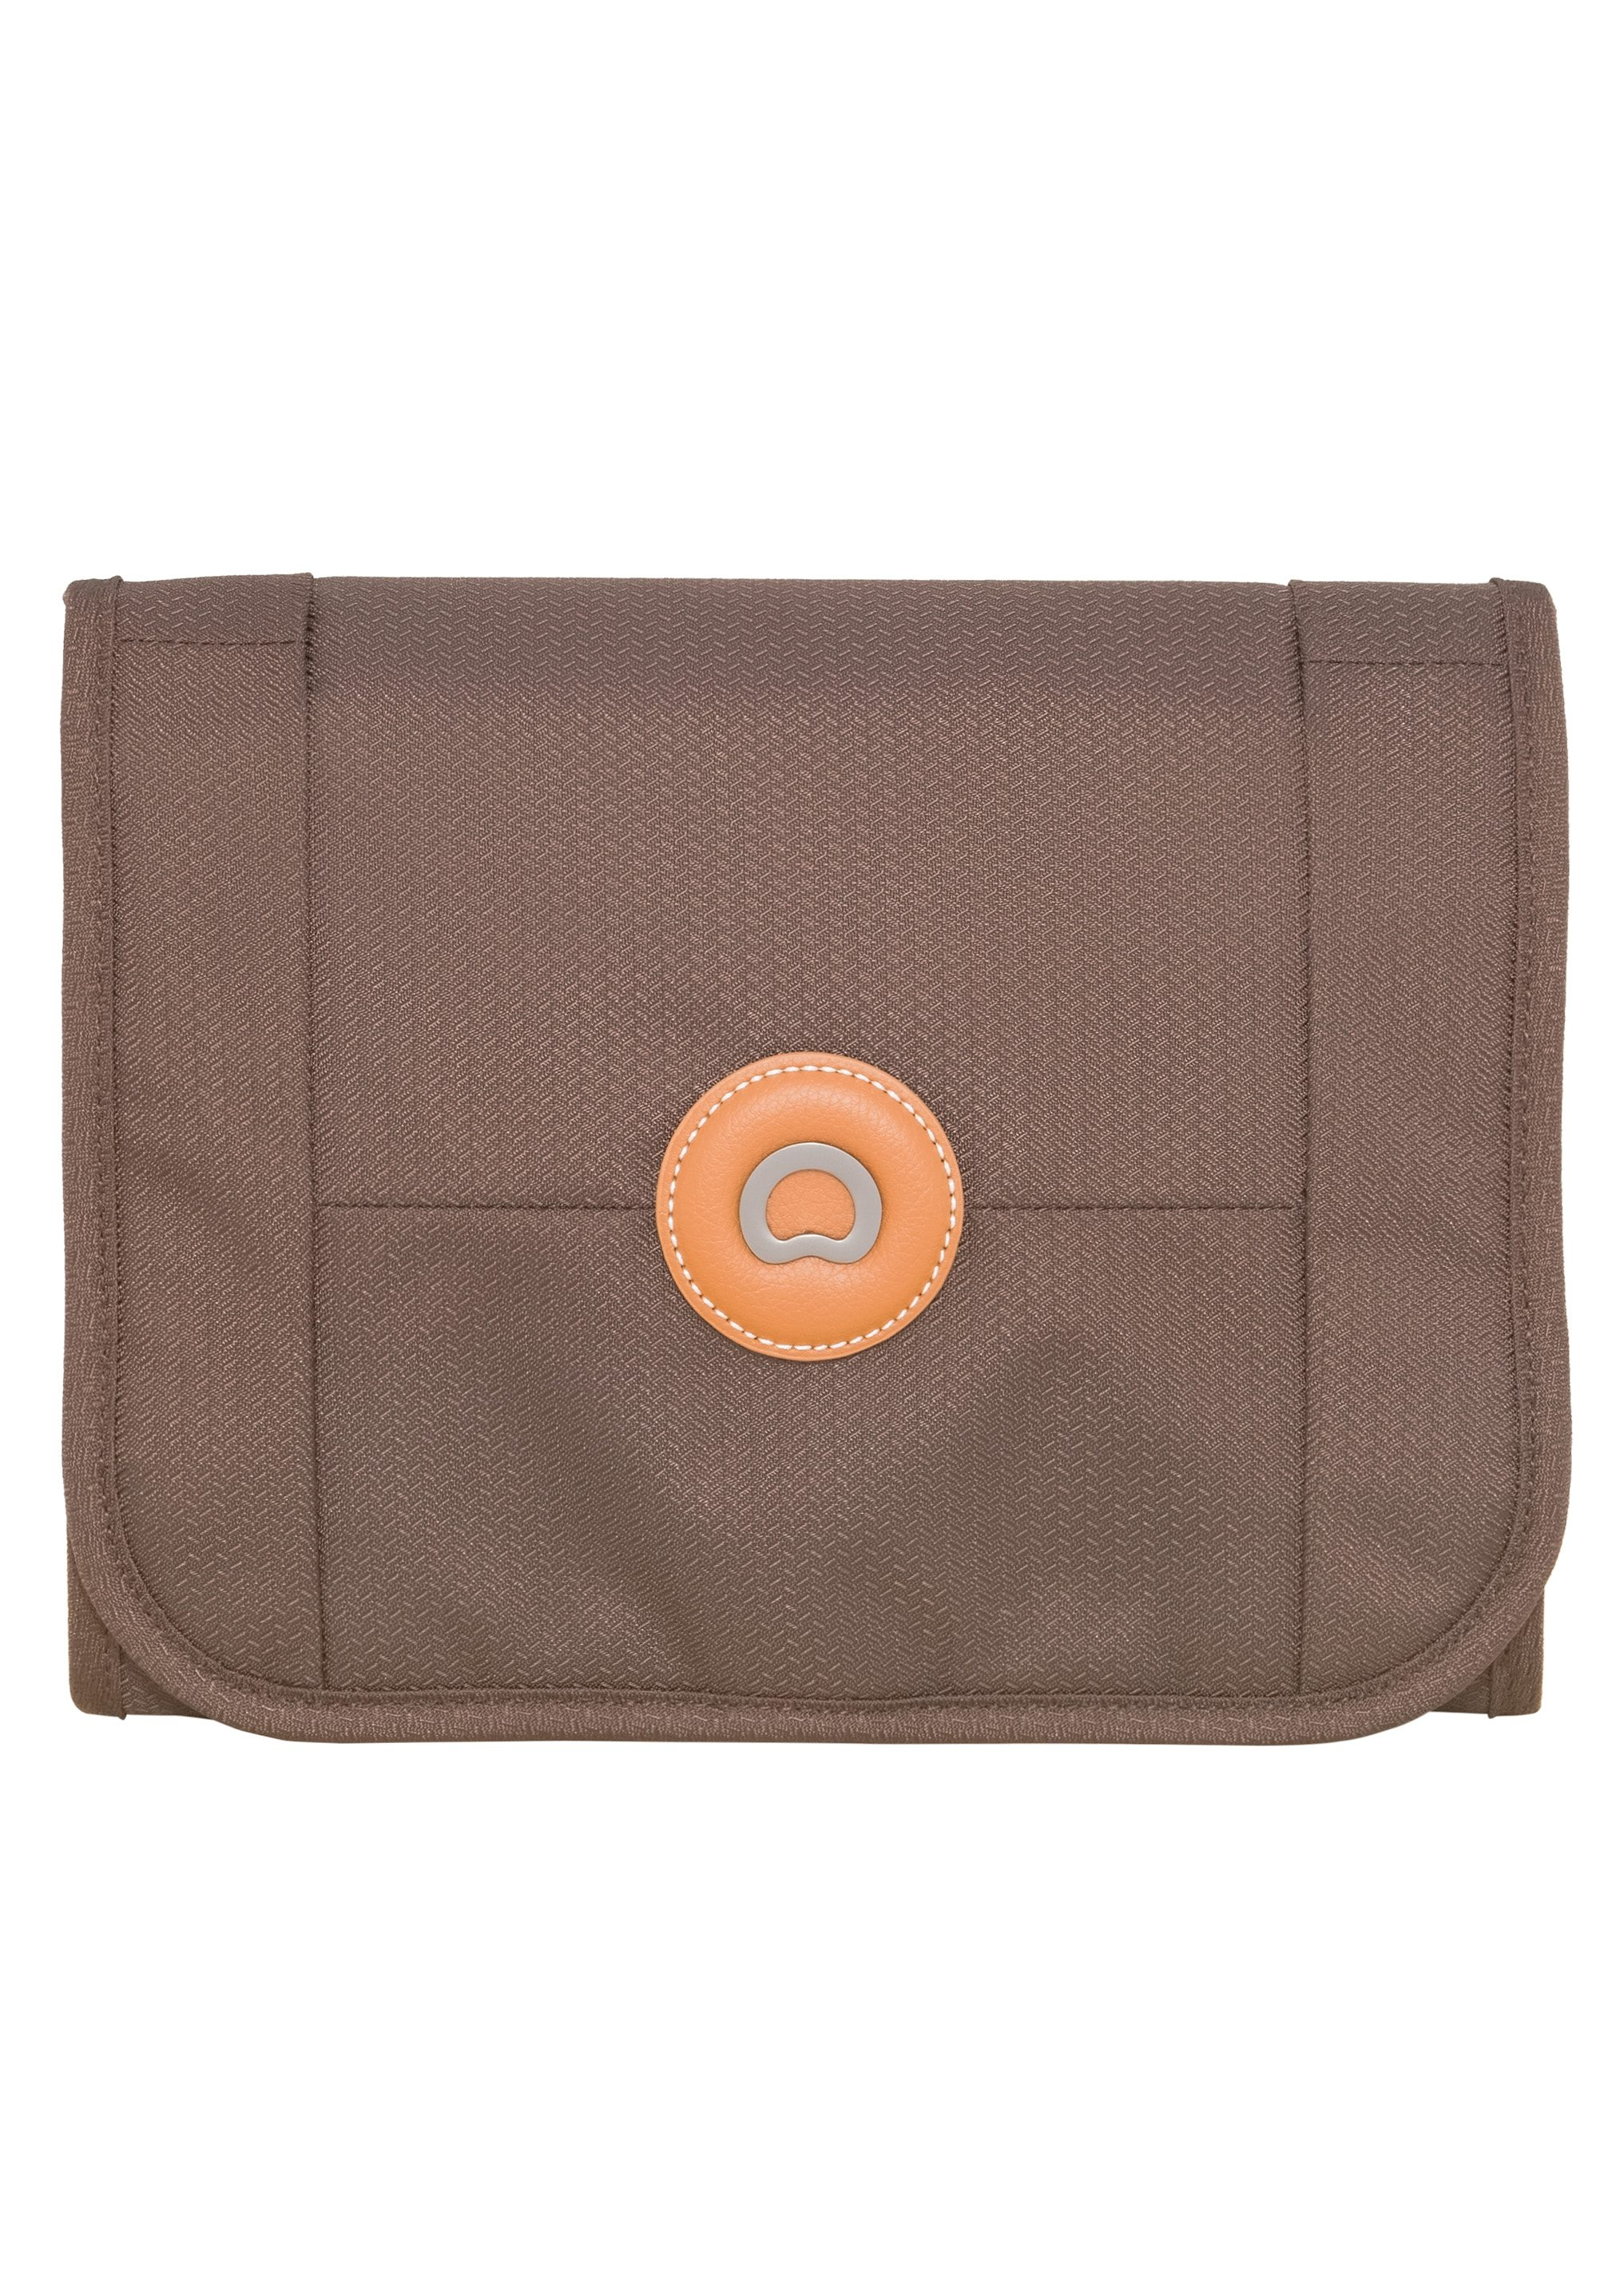 DELSEY Kulturtasche zum Aufhängen, »Châtelet soft+«